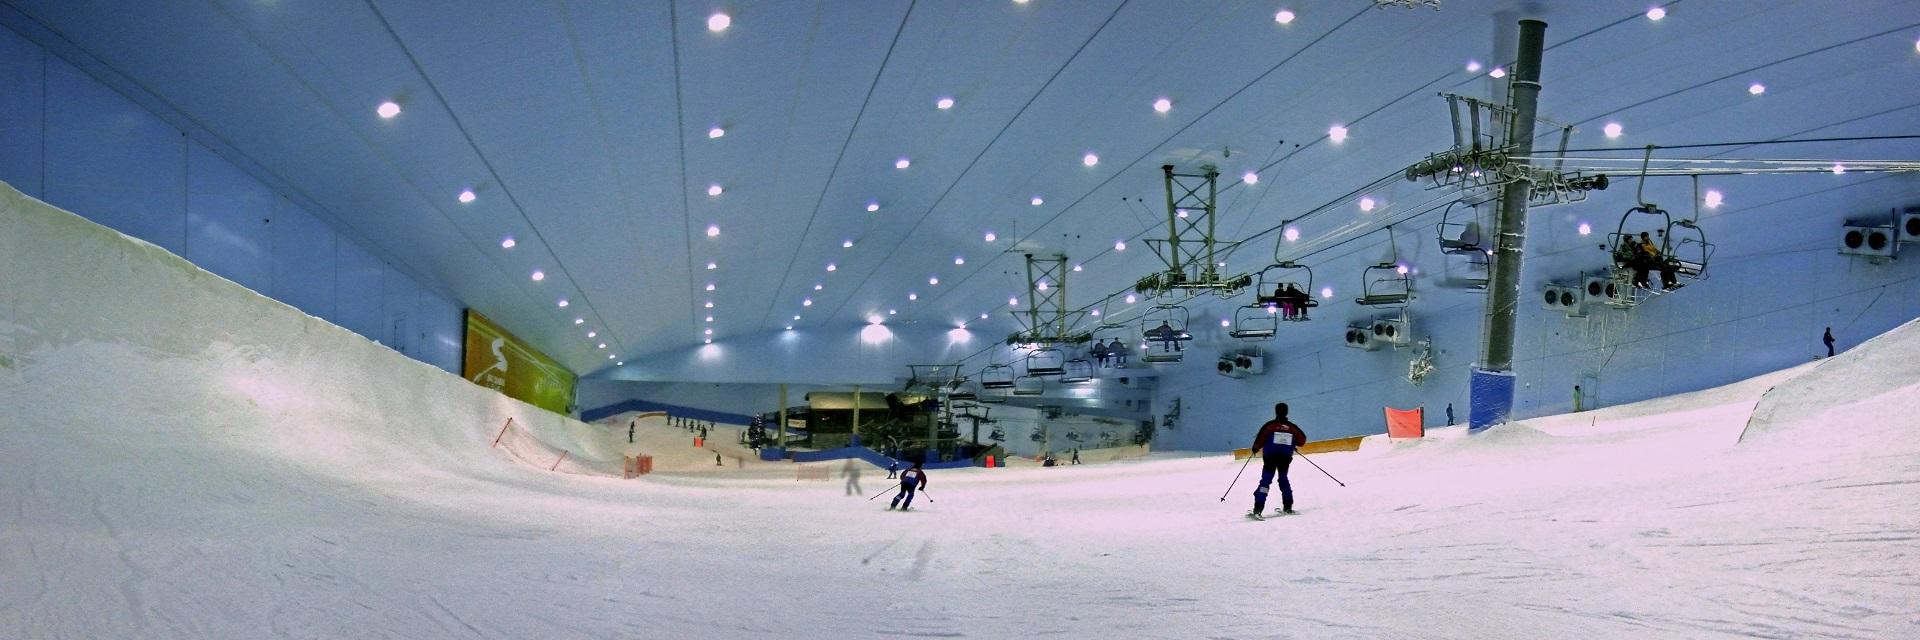 Ski_Dubai_Slope_001